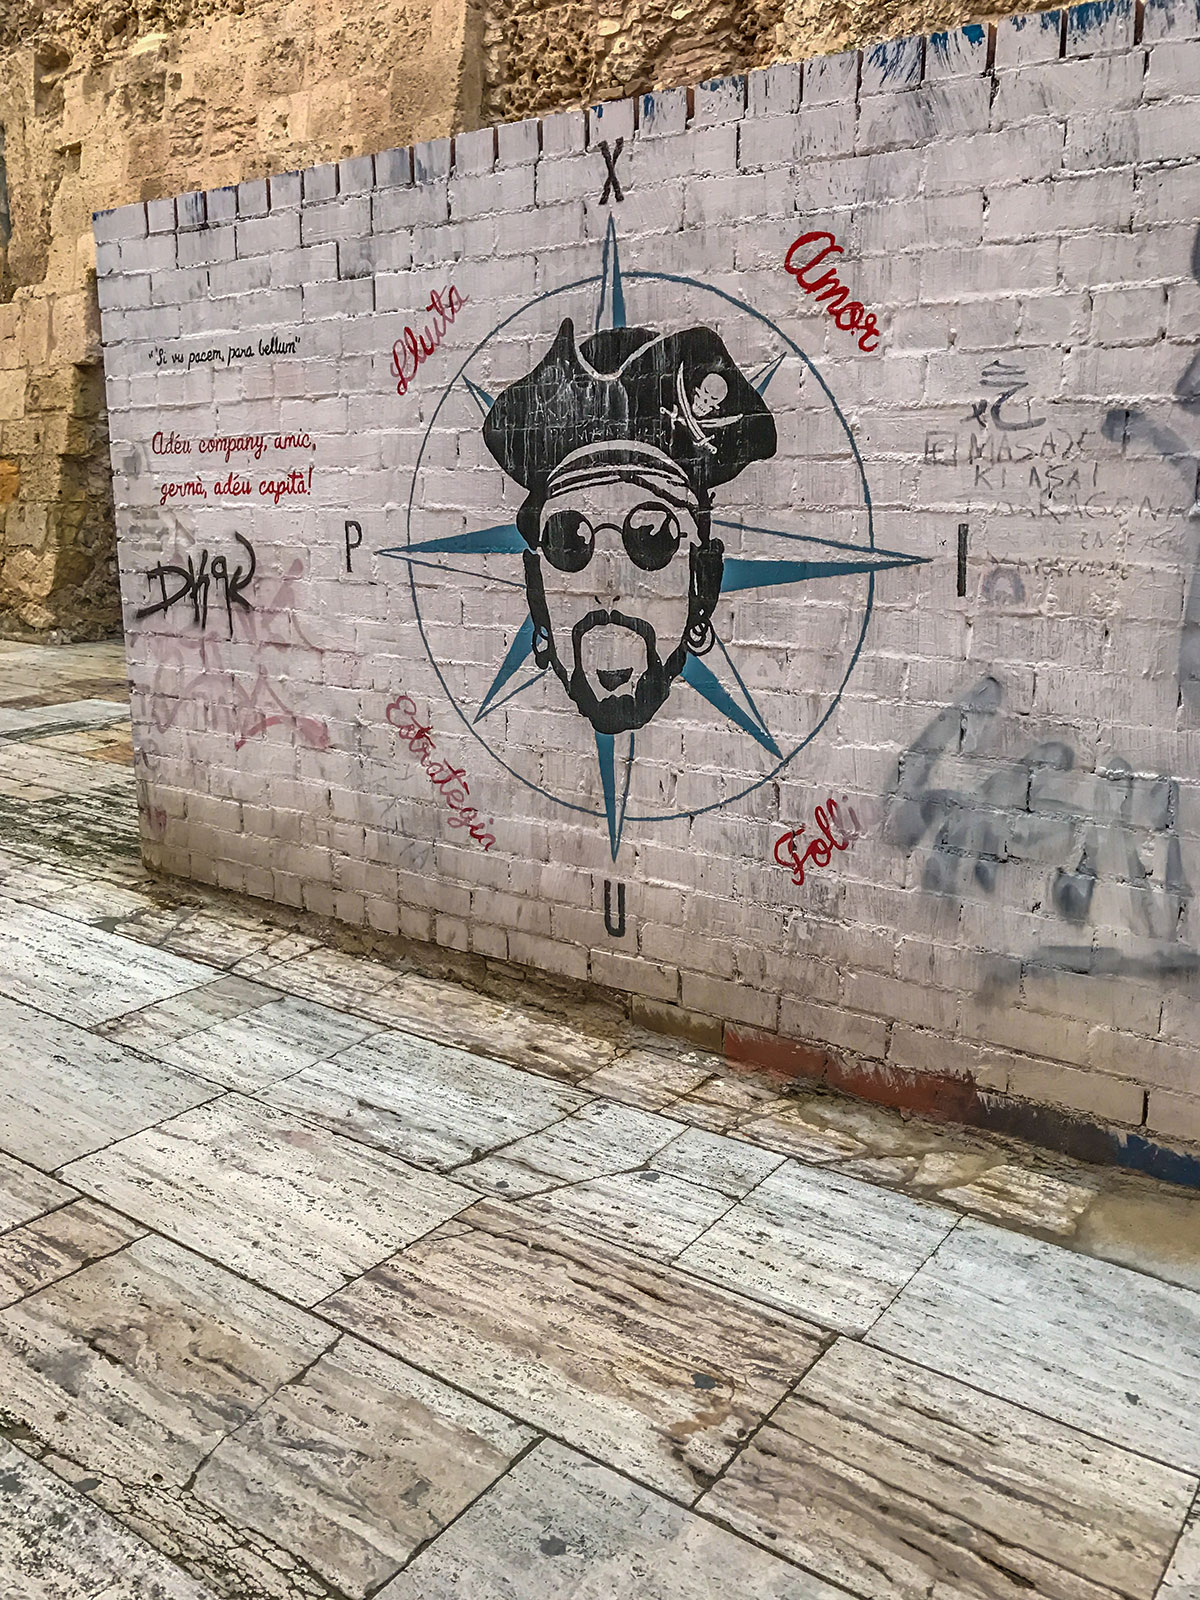 Spanien, Katalonien, Tarragona, alte Mauer mit Graffiti